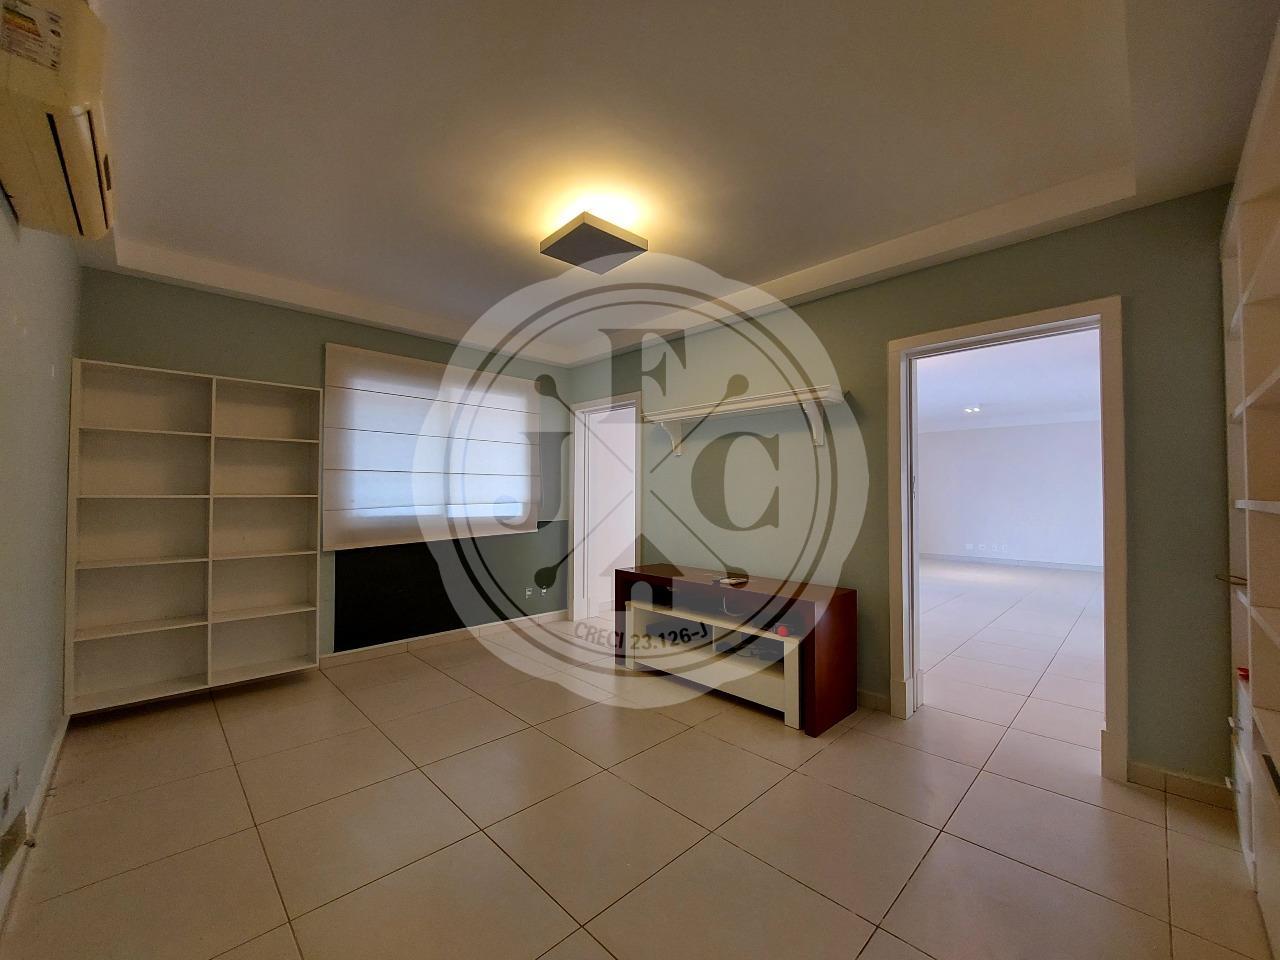 Apartamento para aluguel no Bosque das Juritis: Sala Íntima